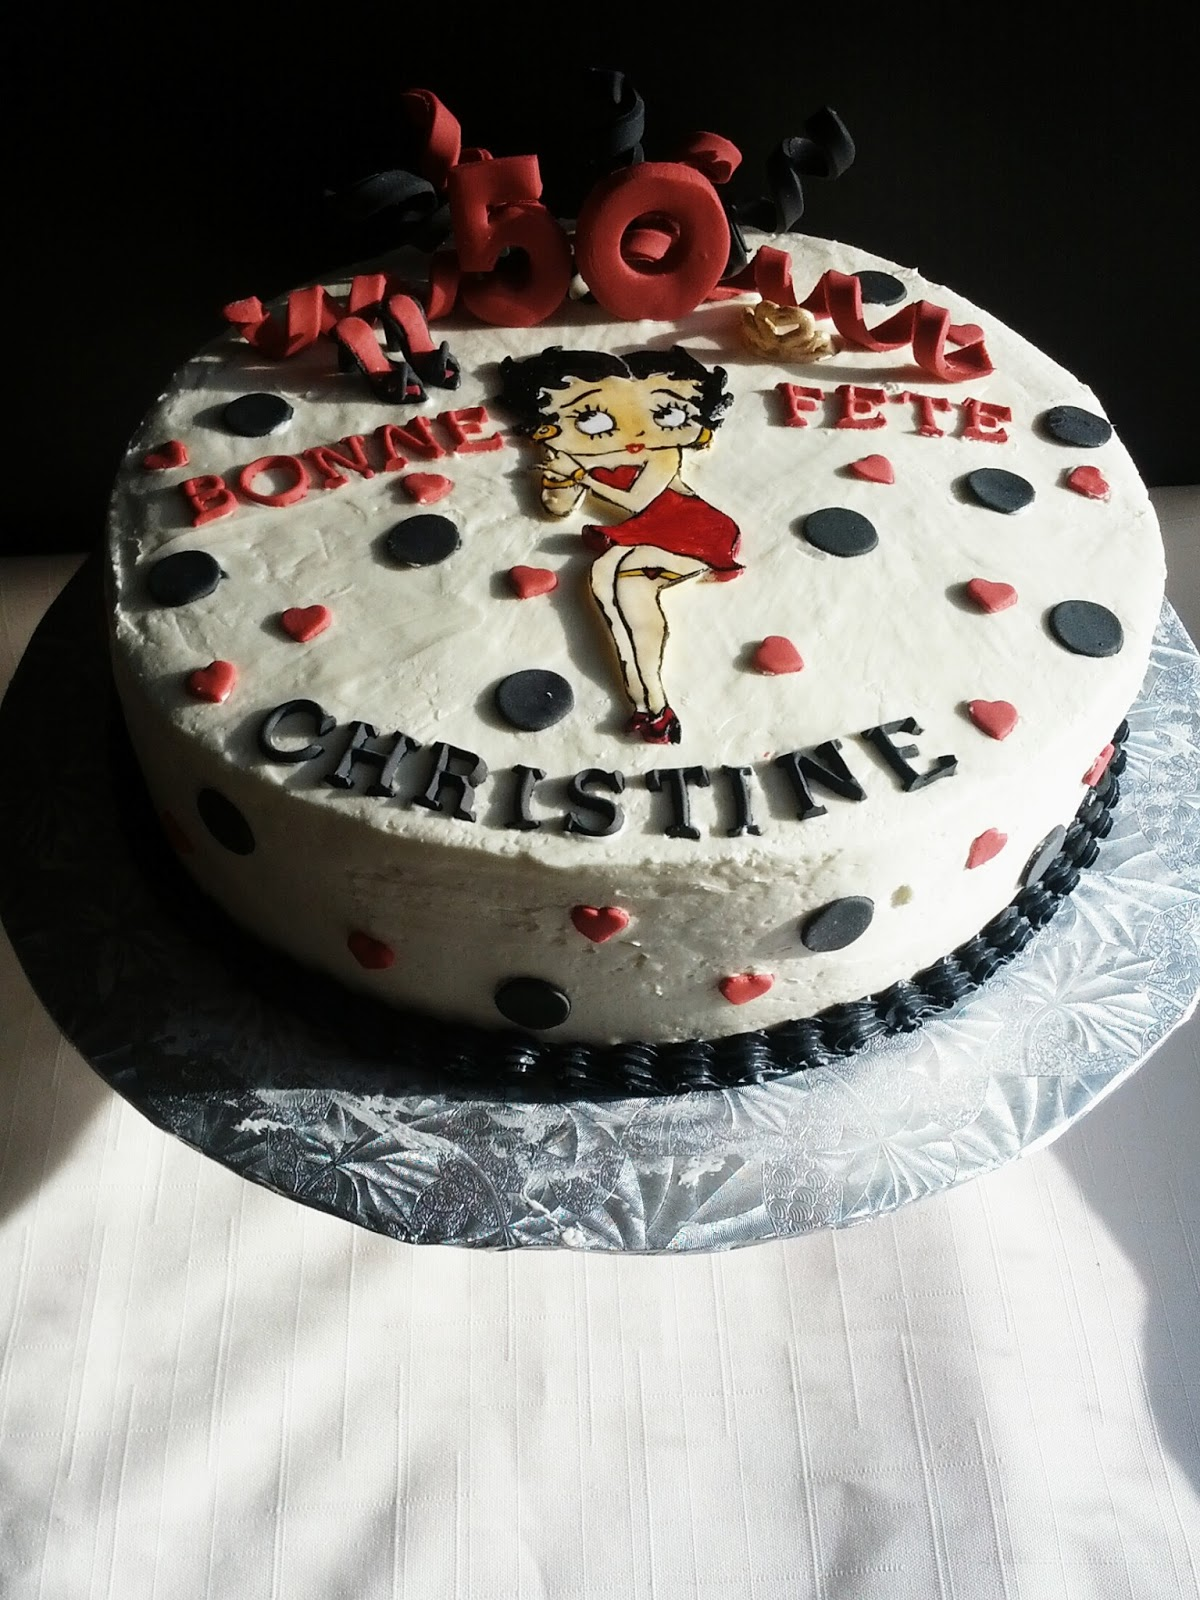 Second Generation Cake Design Betty Boop 50th Birthday Cake